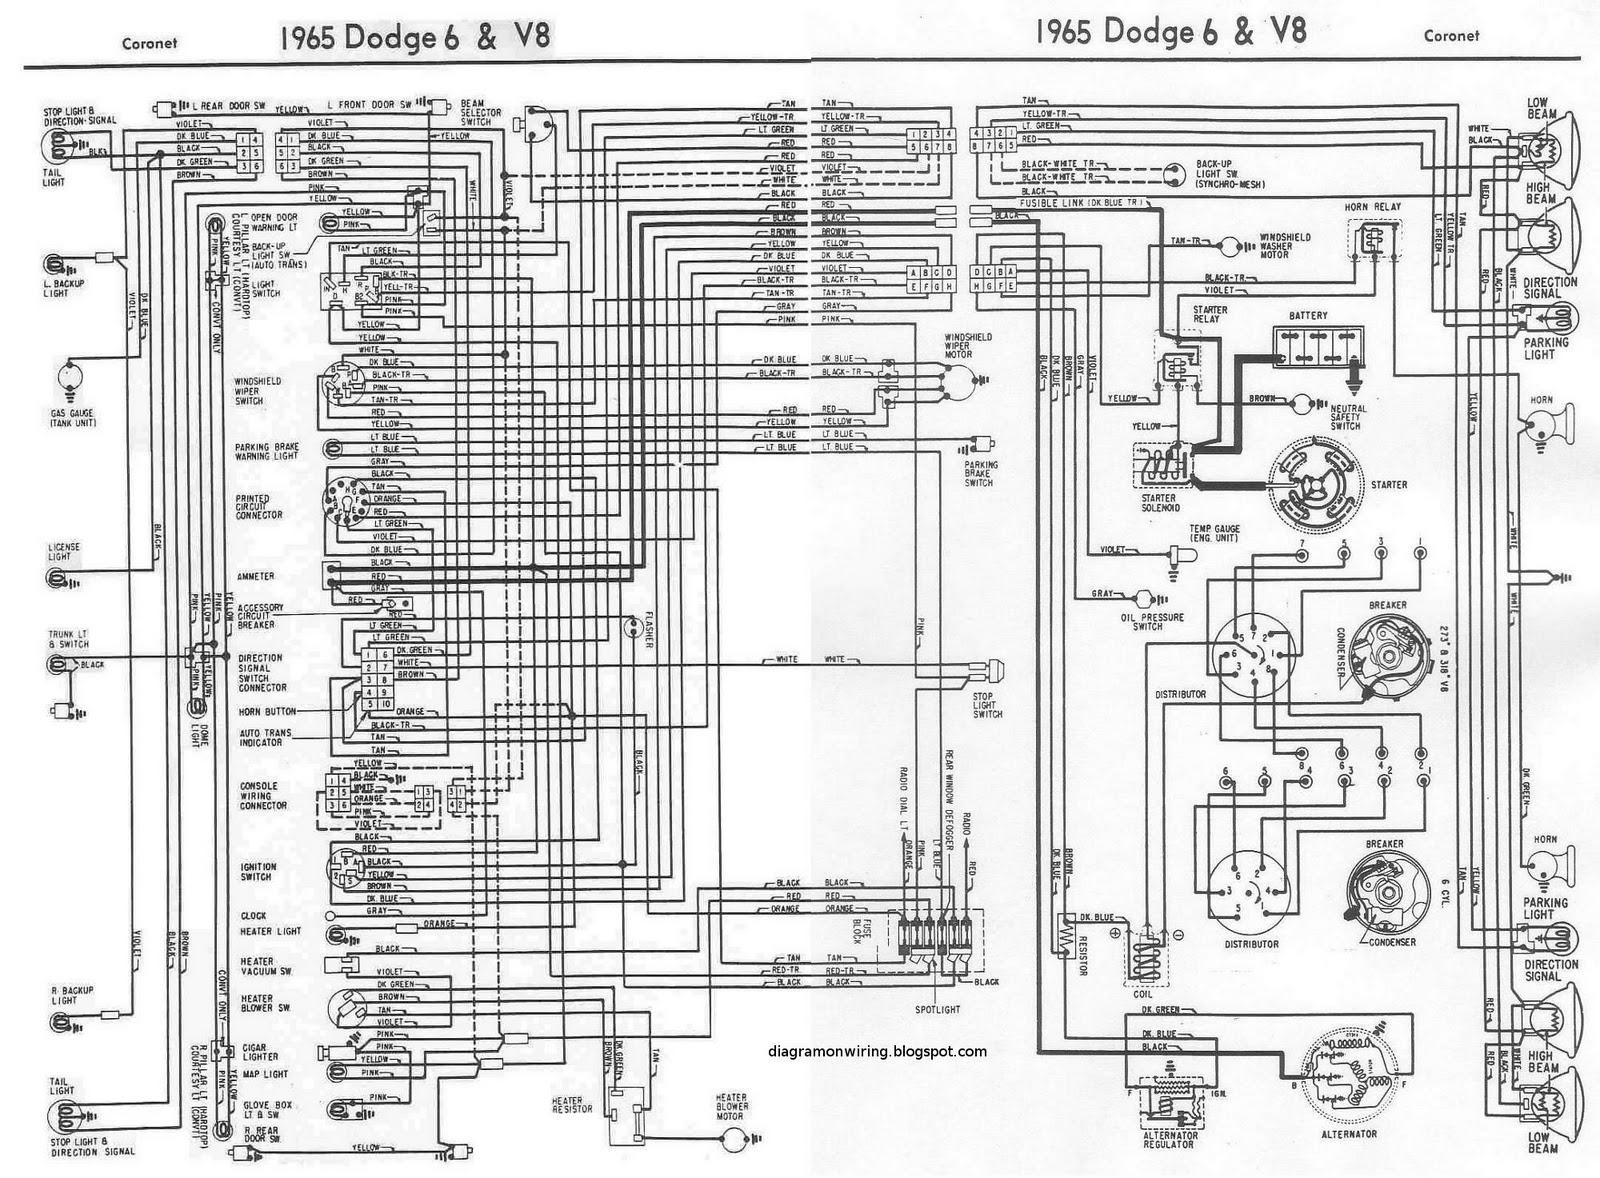 1963 dodge dart wiring diagram easy wiring diagrams u2022 rh art isere com